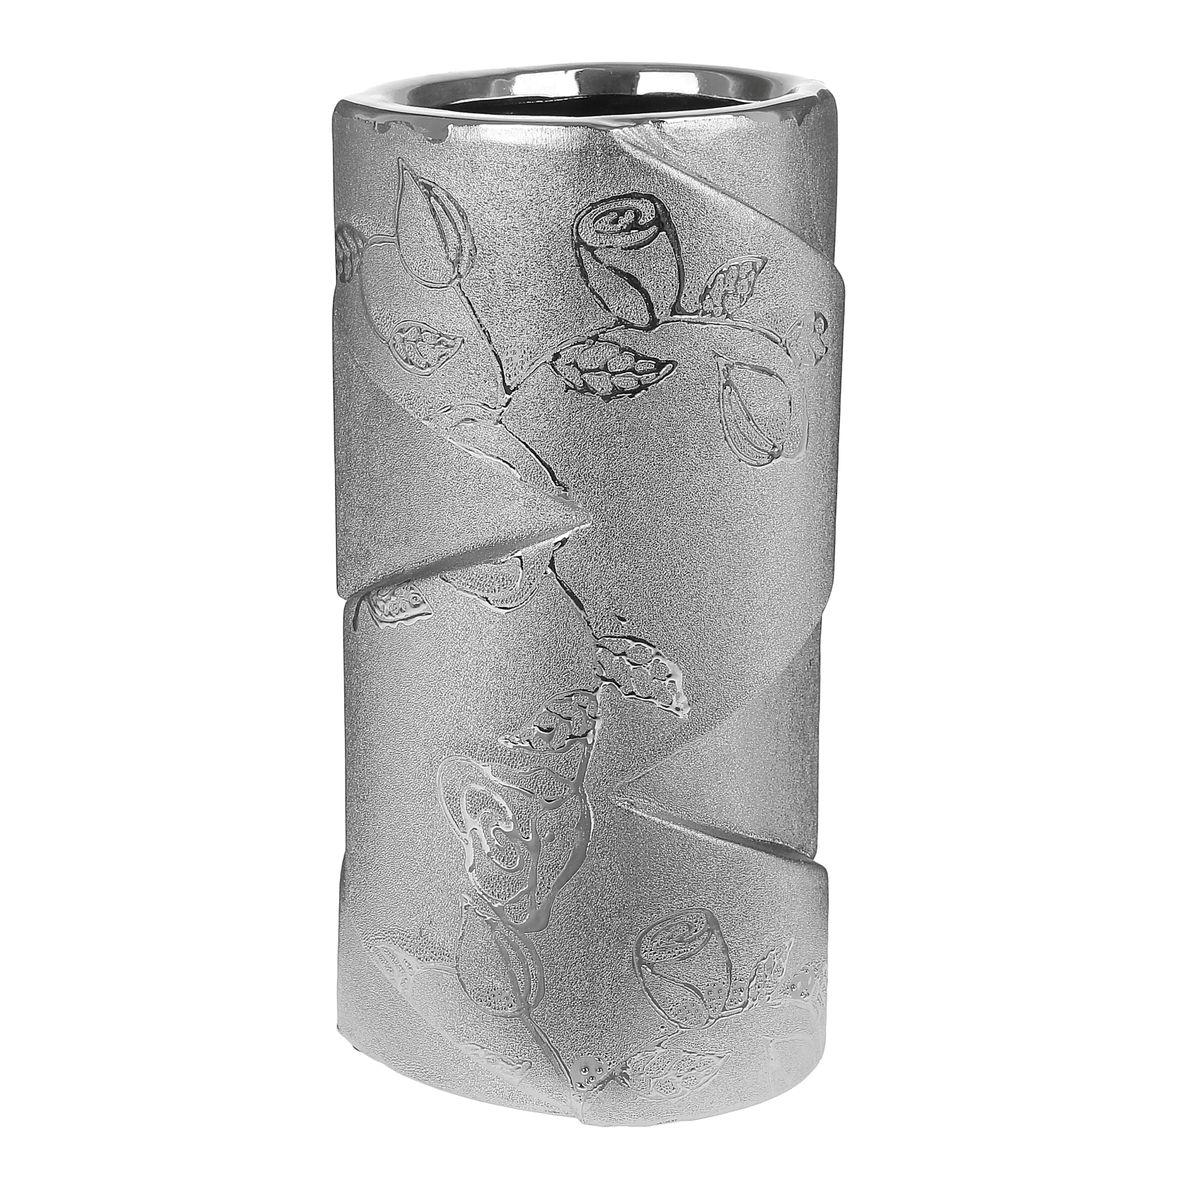 Ваза Sima-land Серебряная роза, высота 18 см ваза плетеная sima land высота 17 см